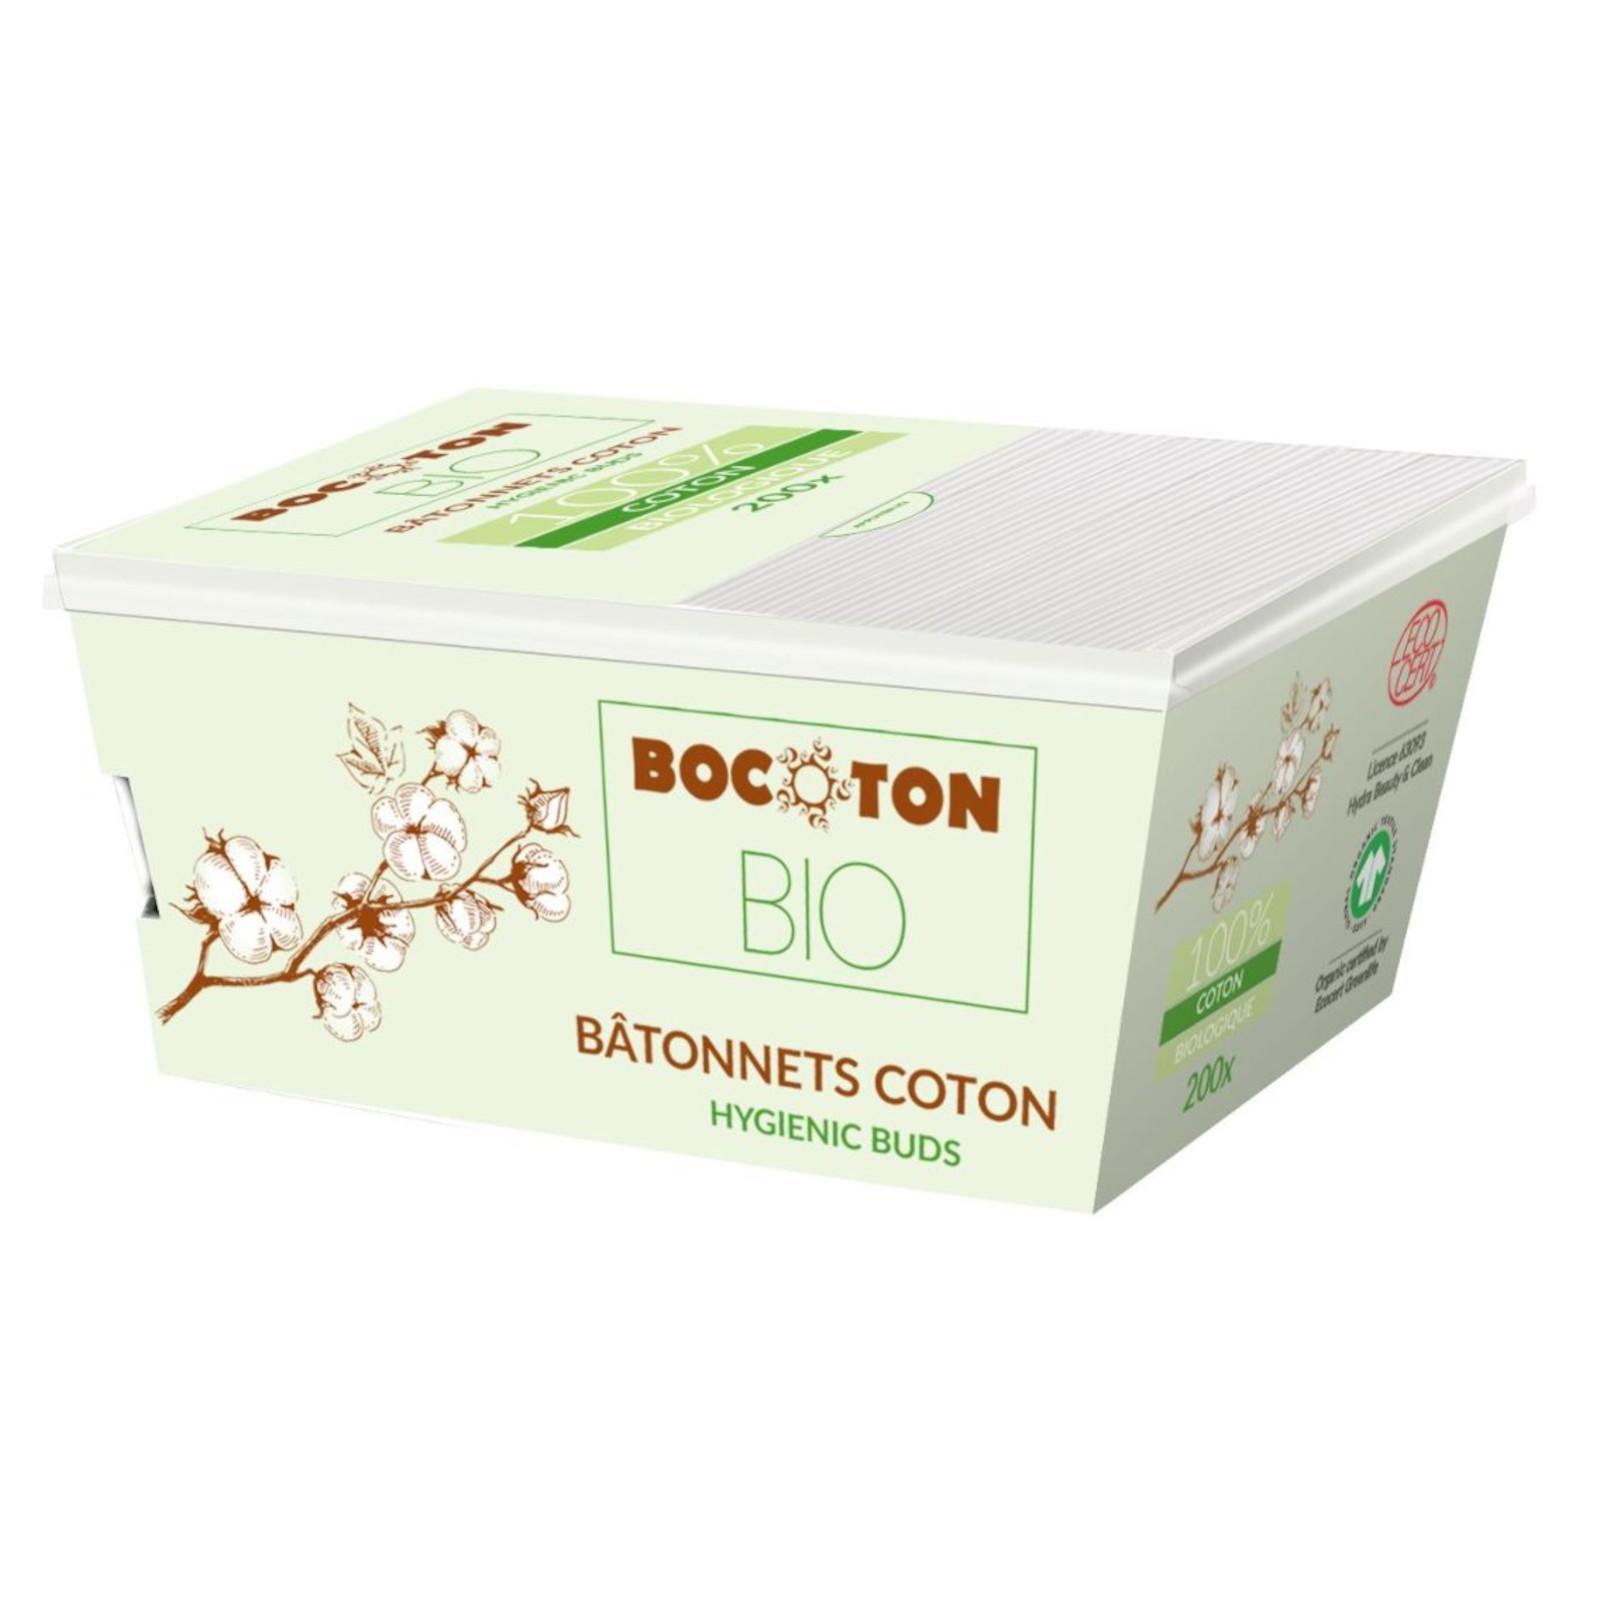 Bocoton Vatové tyčinky do uší z biobavlny, cotton buds 200 ks